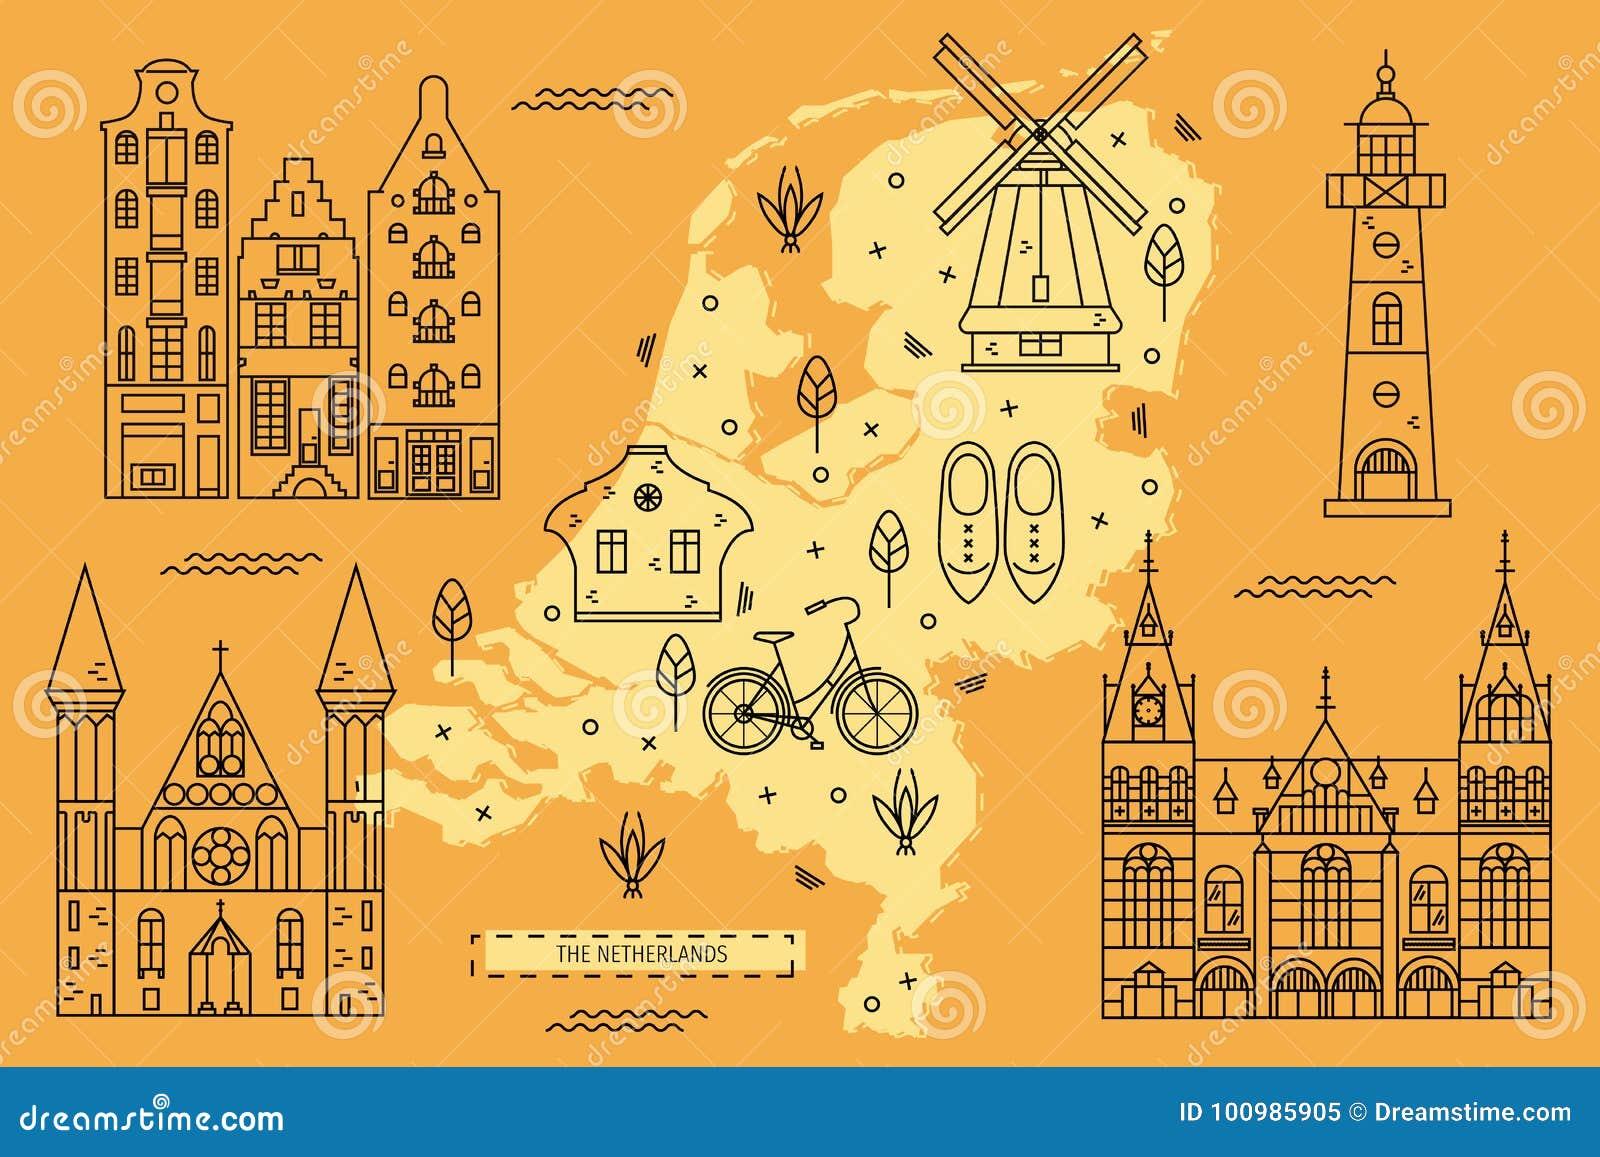 The Netherlands Map In Flat Line Design Stock Vector Illustration